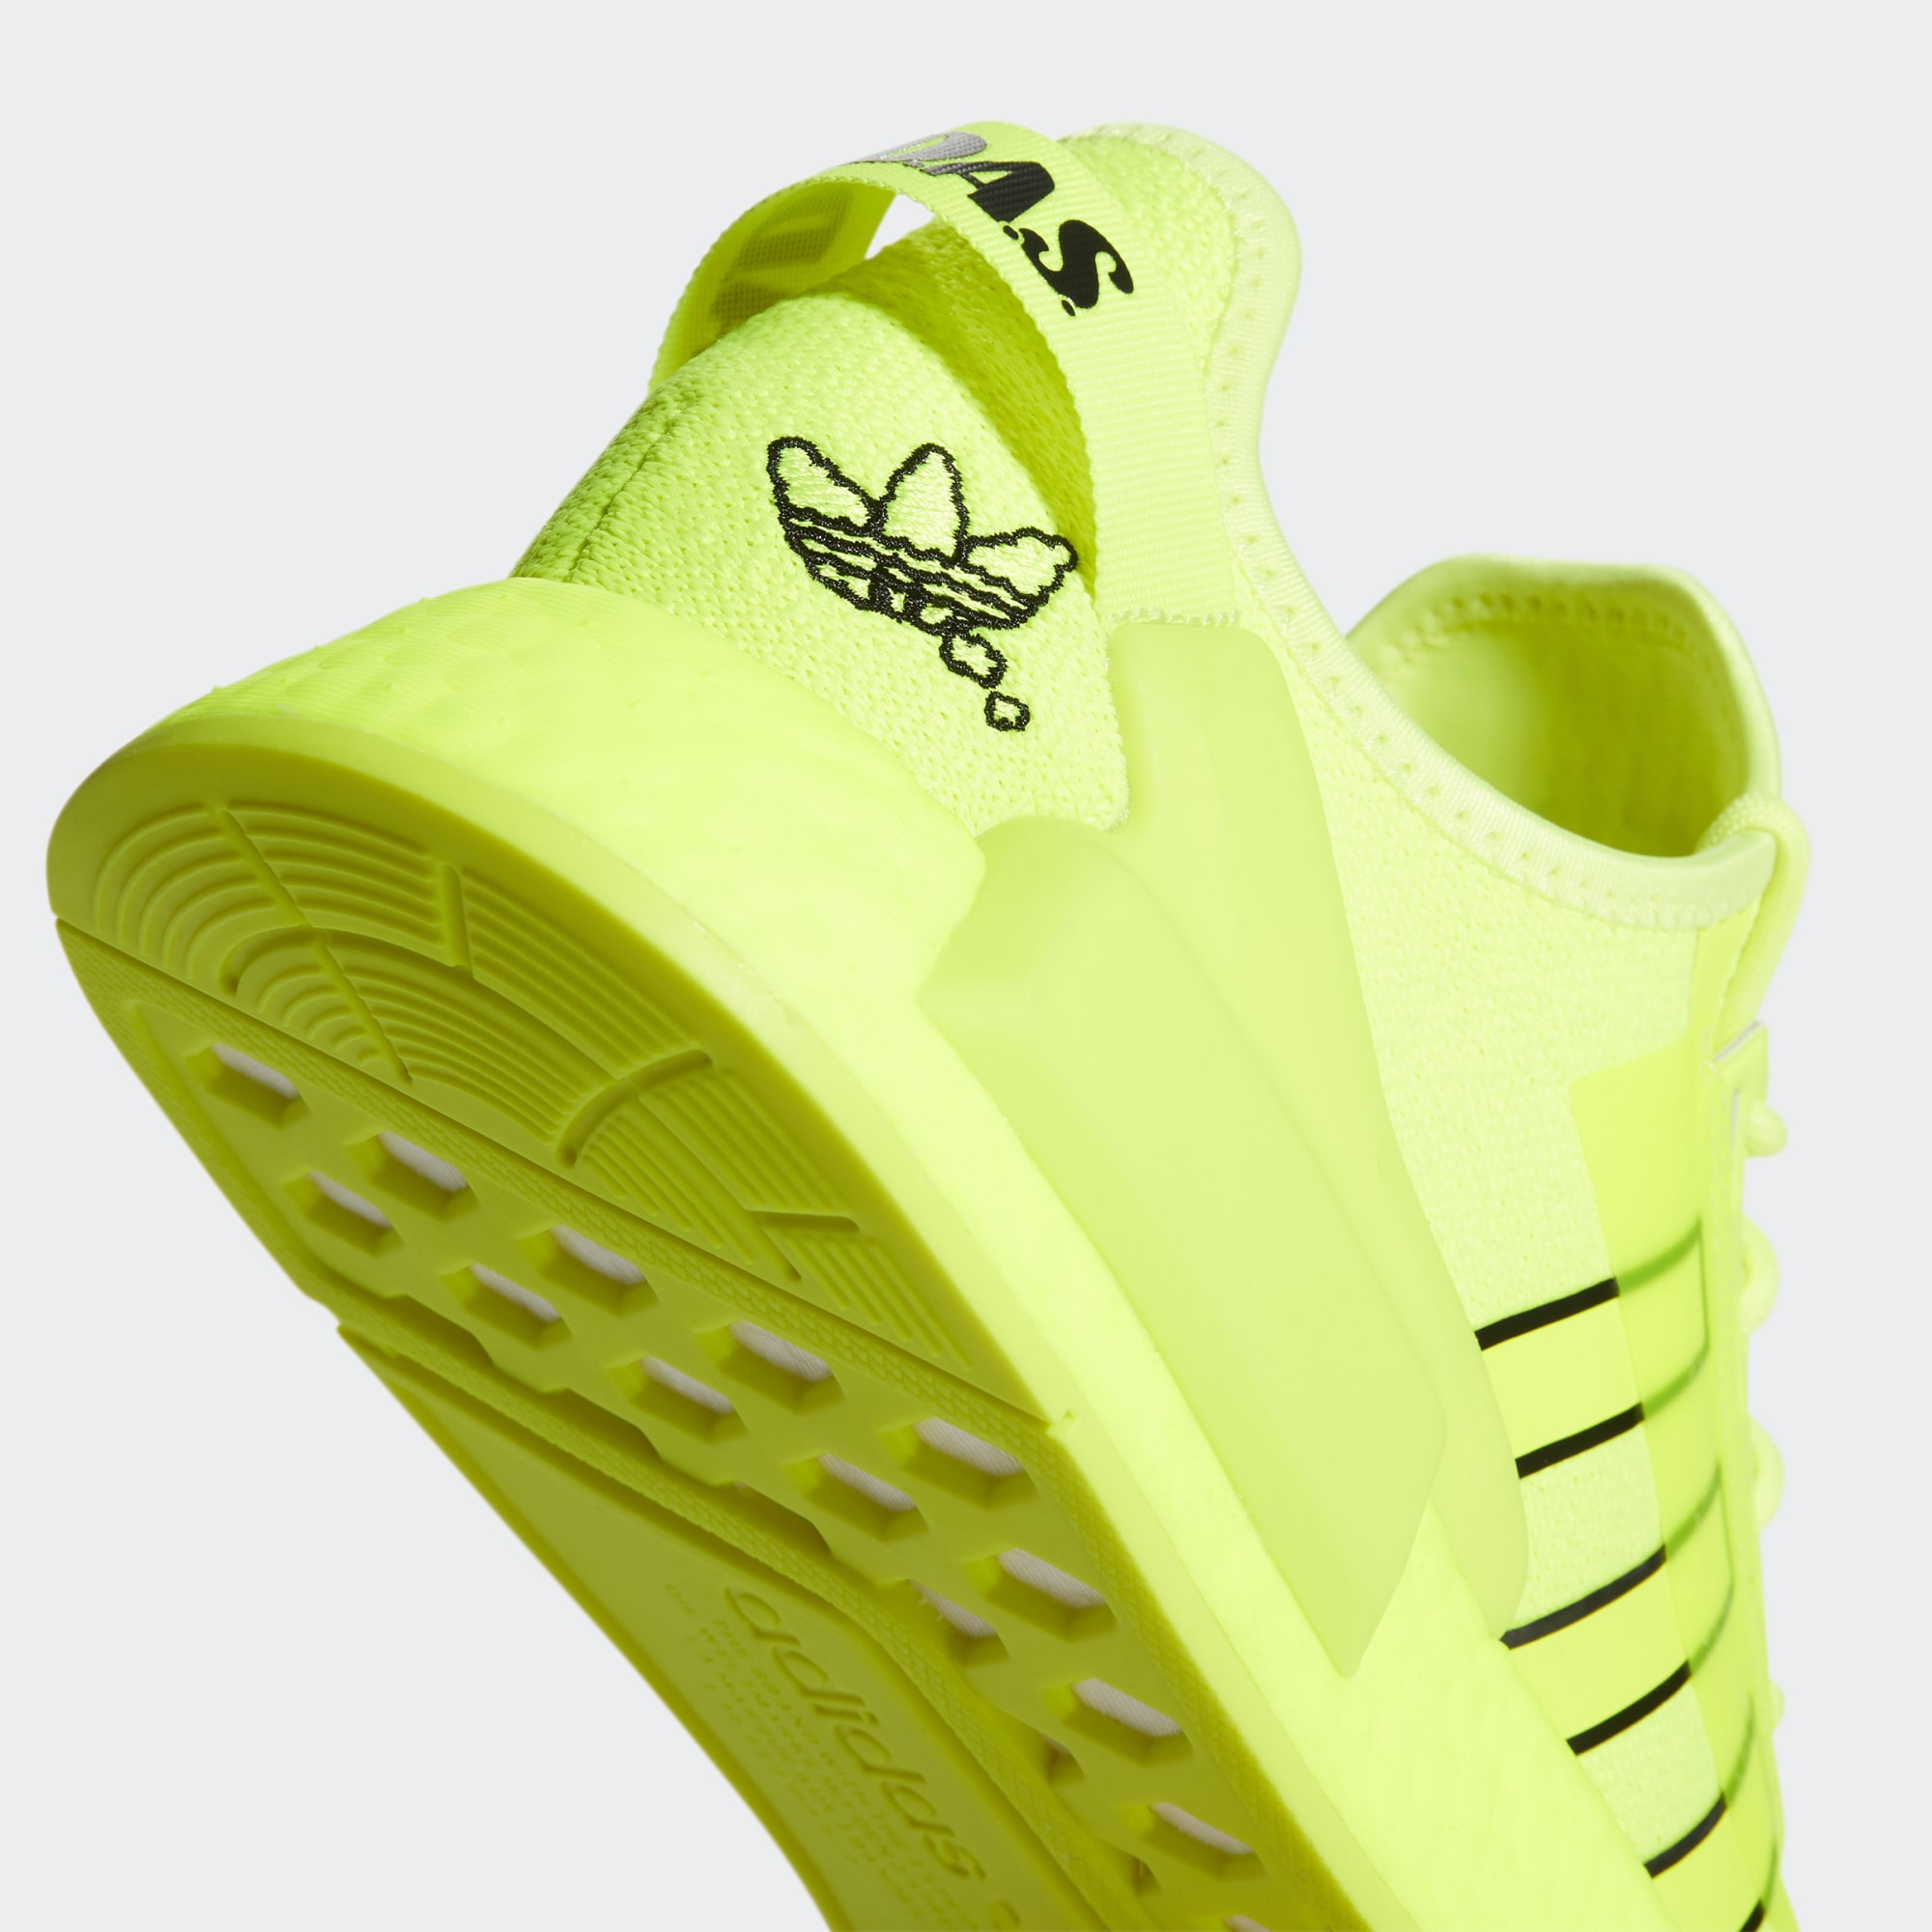 NMD_R1_V2_Shoes_Yellow_H02654_42_detail.jpg